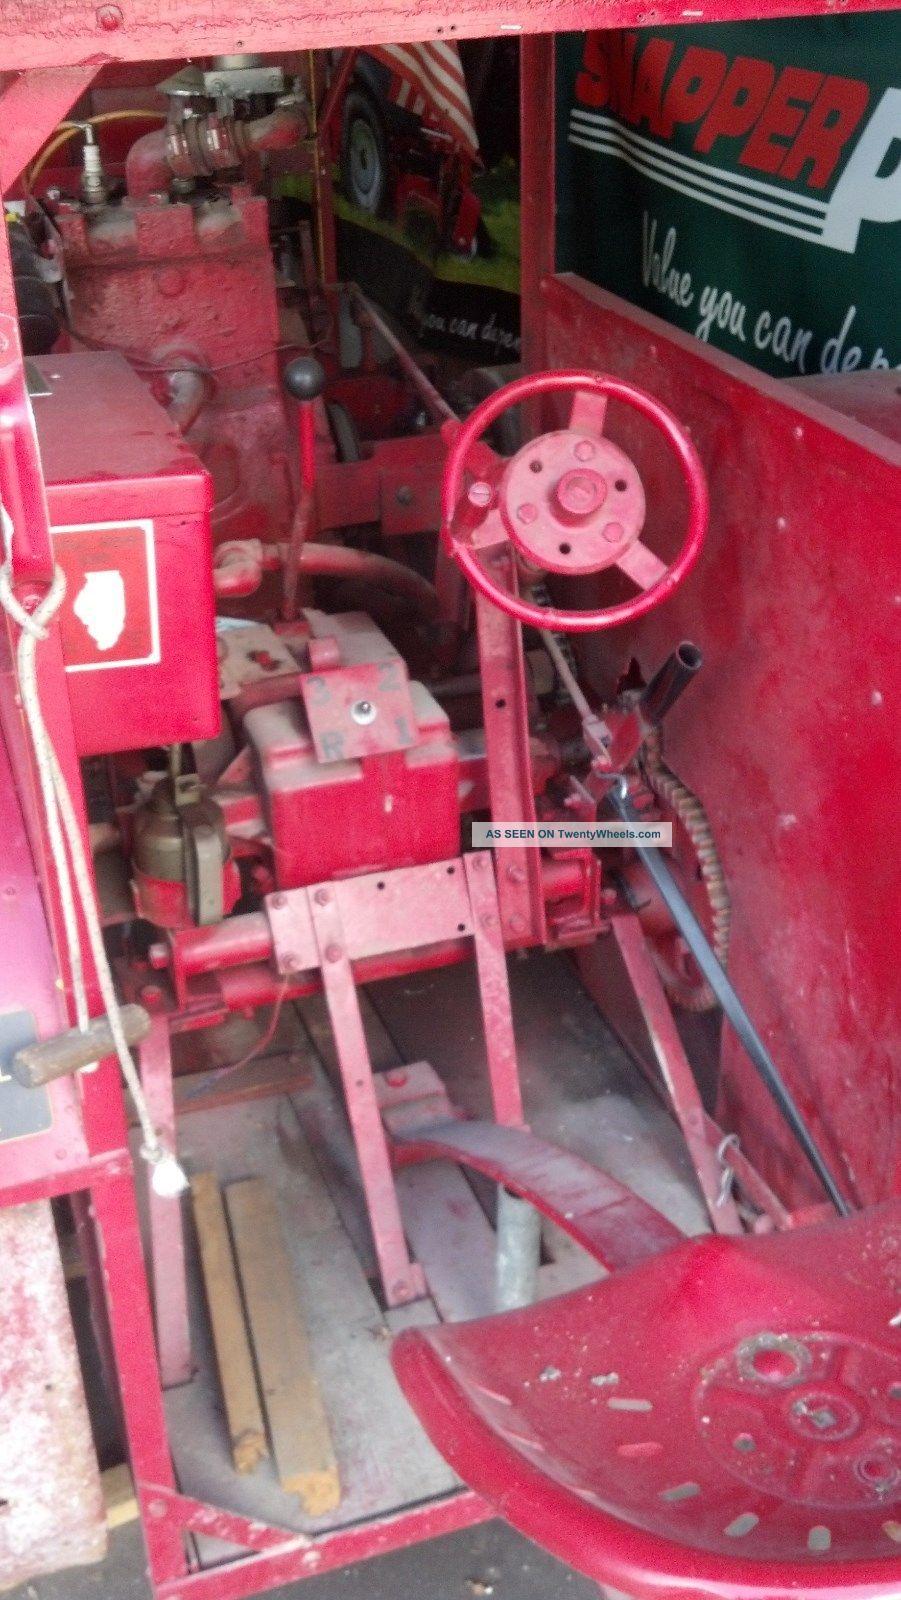 Twin City 40 - 65 Replica Tractor Antique & Vintage Farm Equip photo 5